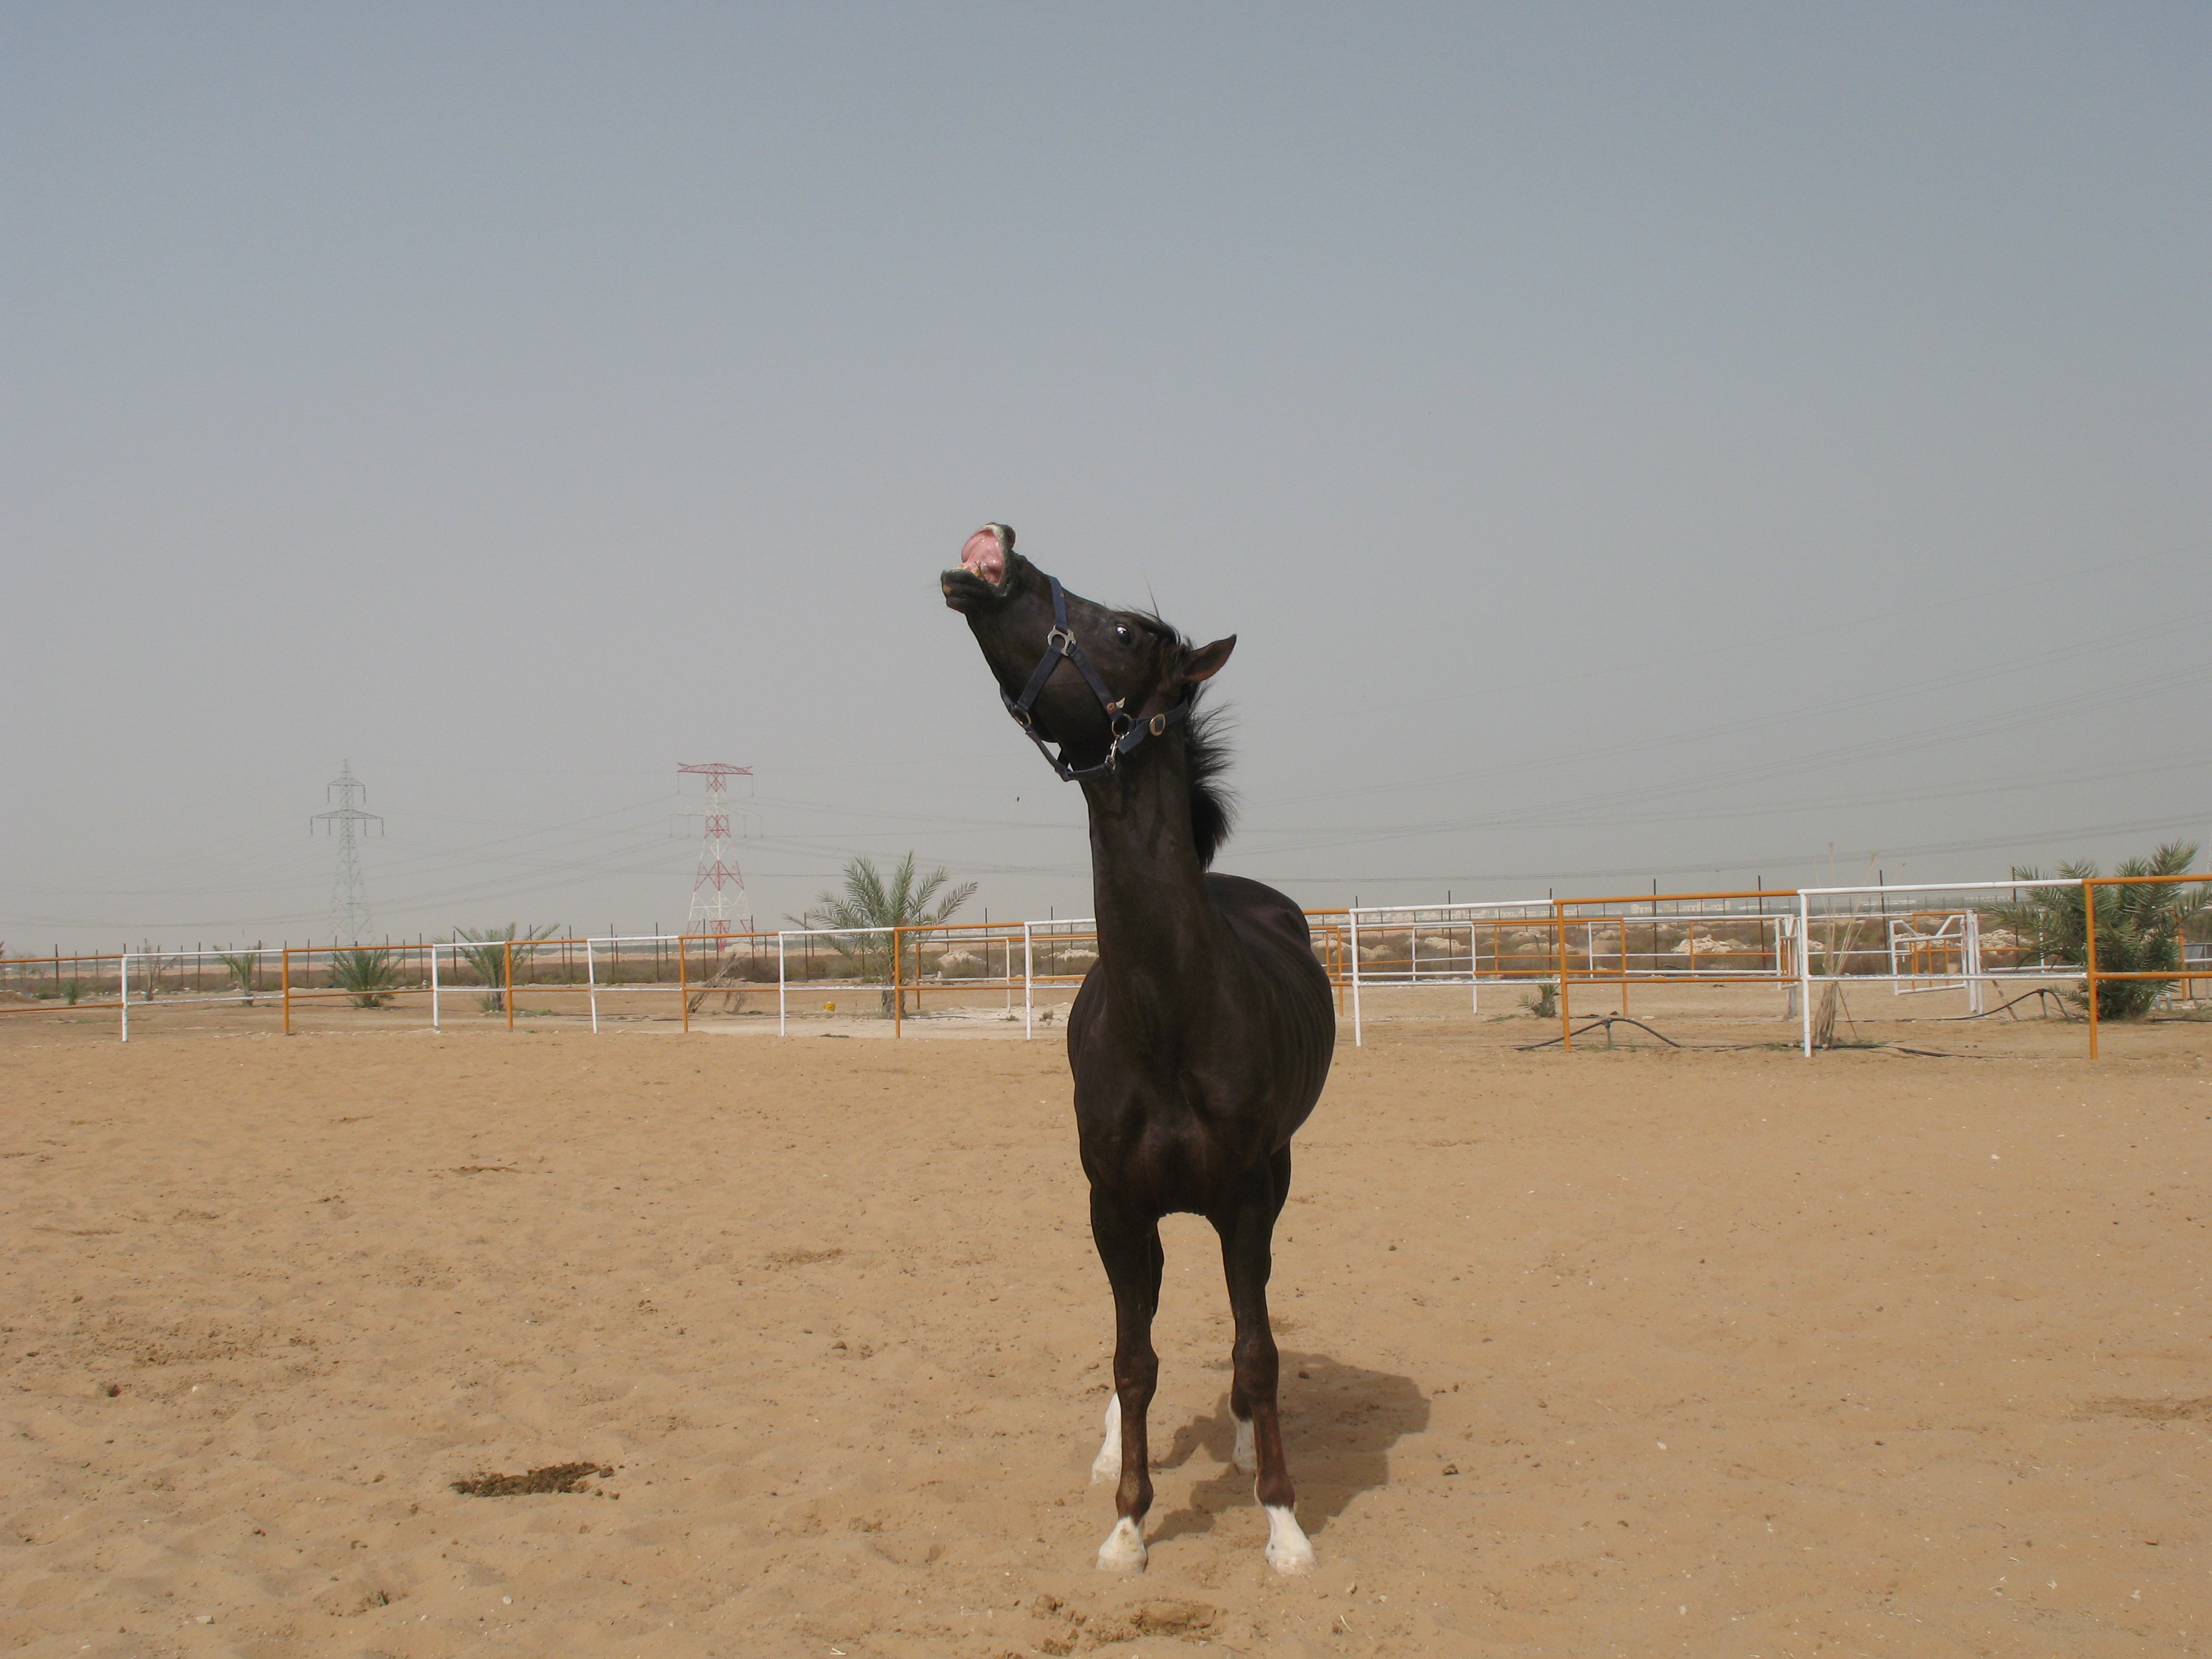 Wadnan Al Thani